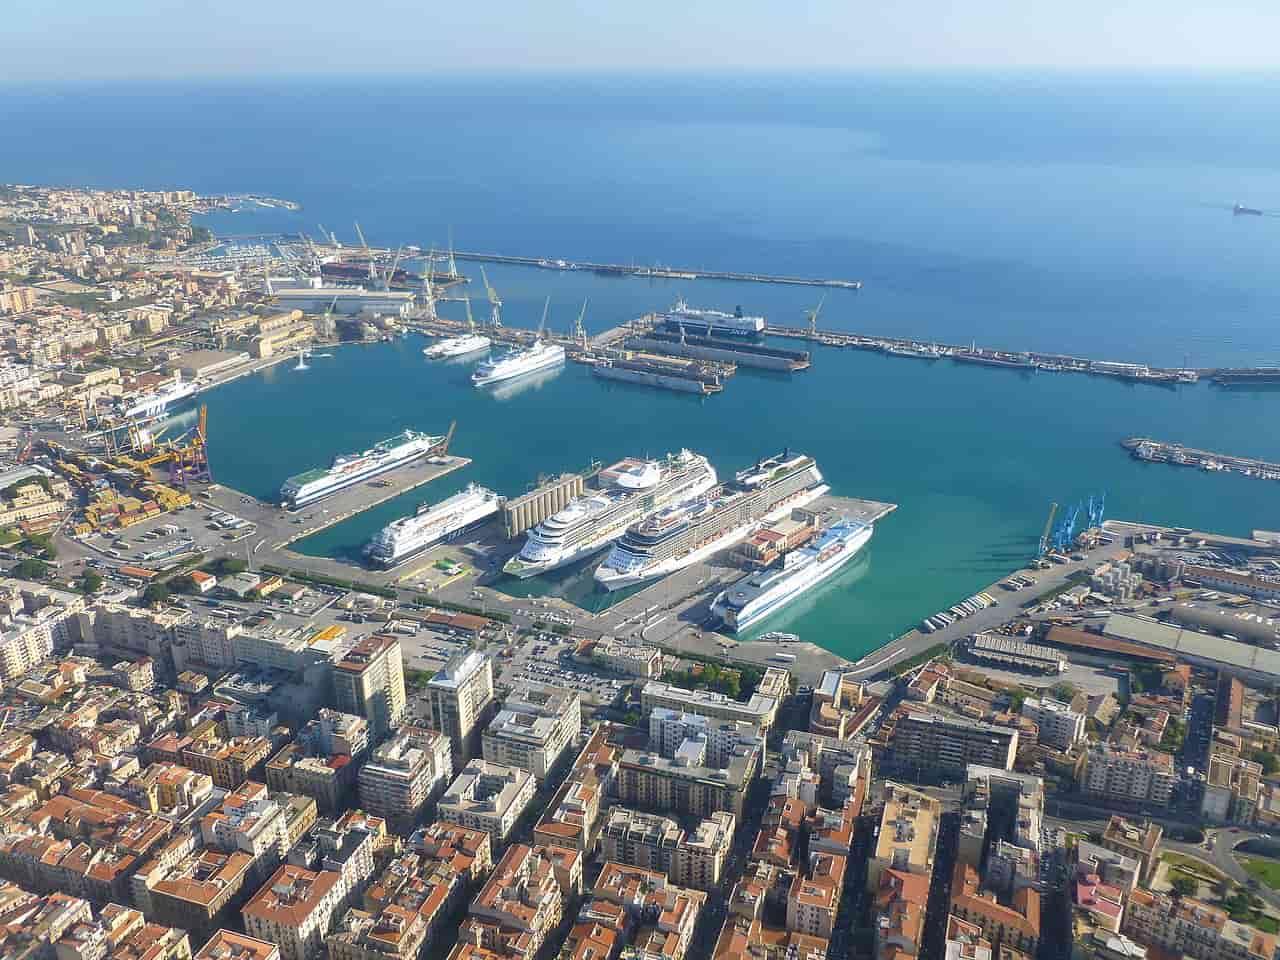 Acquista pneumatici economici a Palermo online